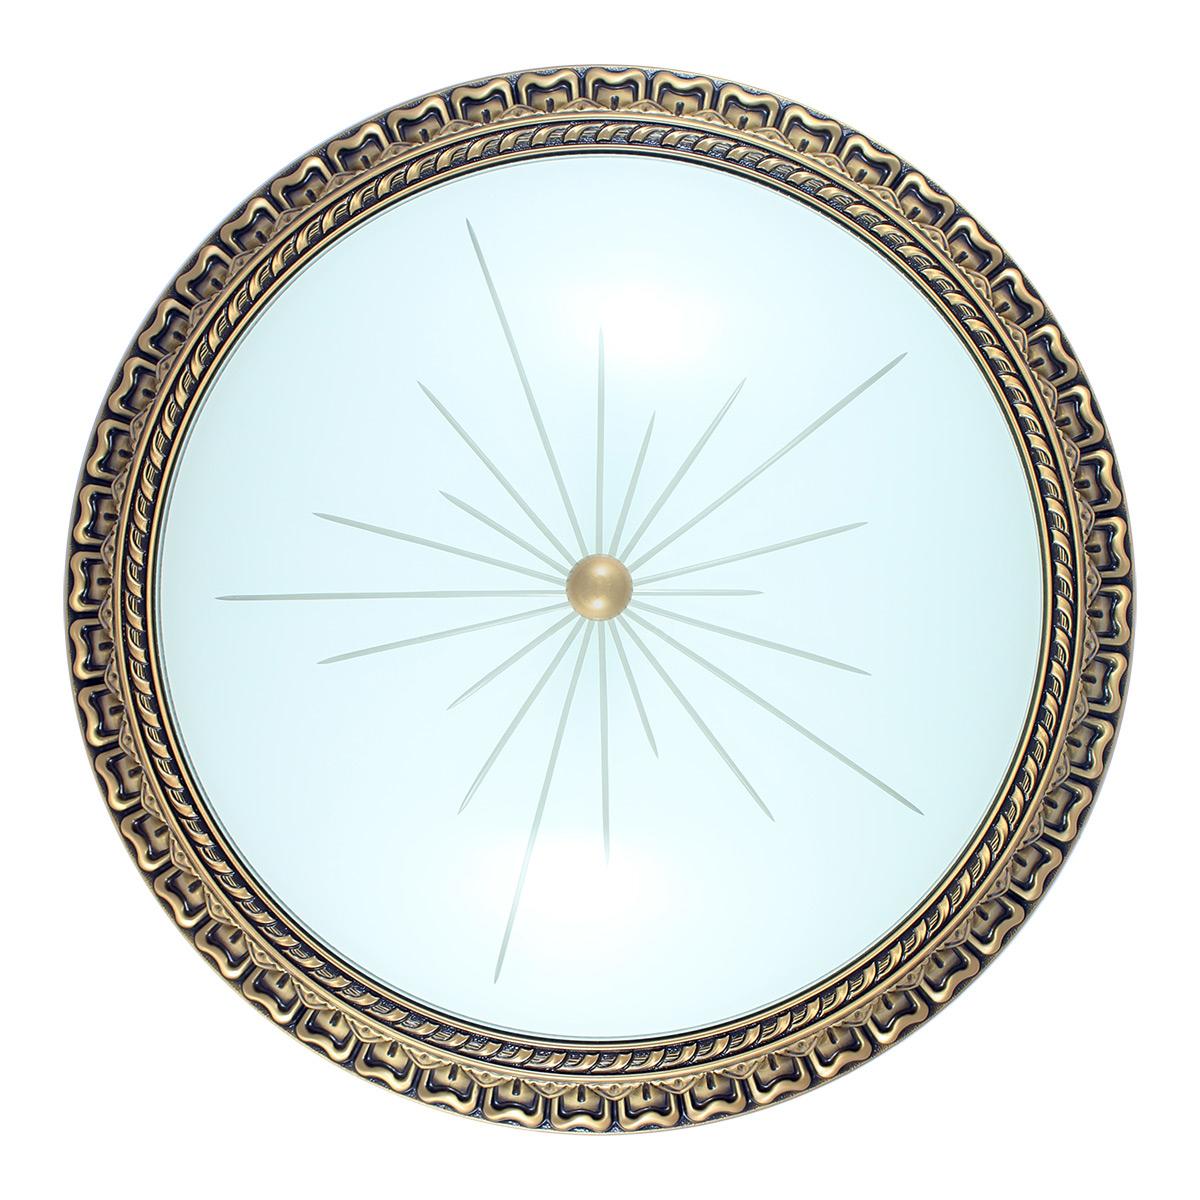 Imagem de Plafoniera in bronzo - Stile decorato - Diametro 50,6 cm